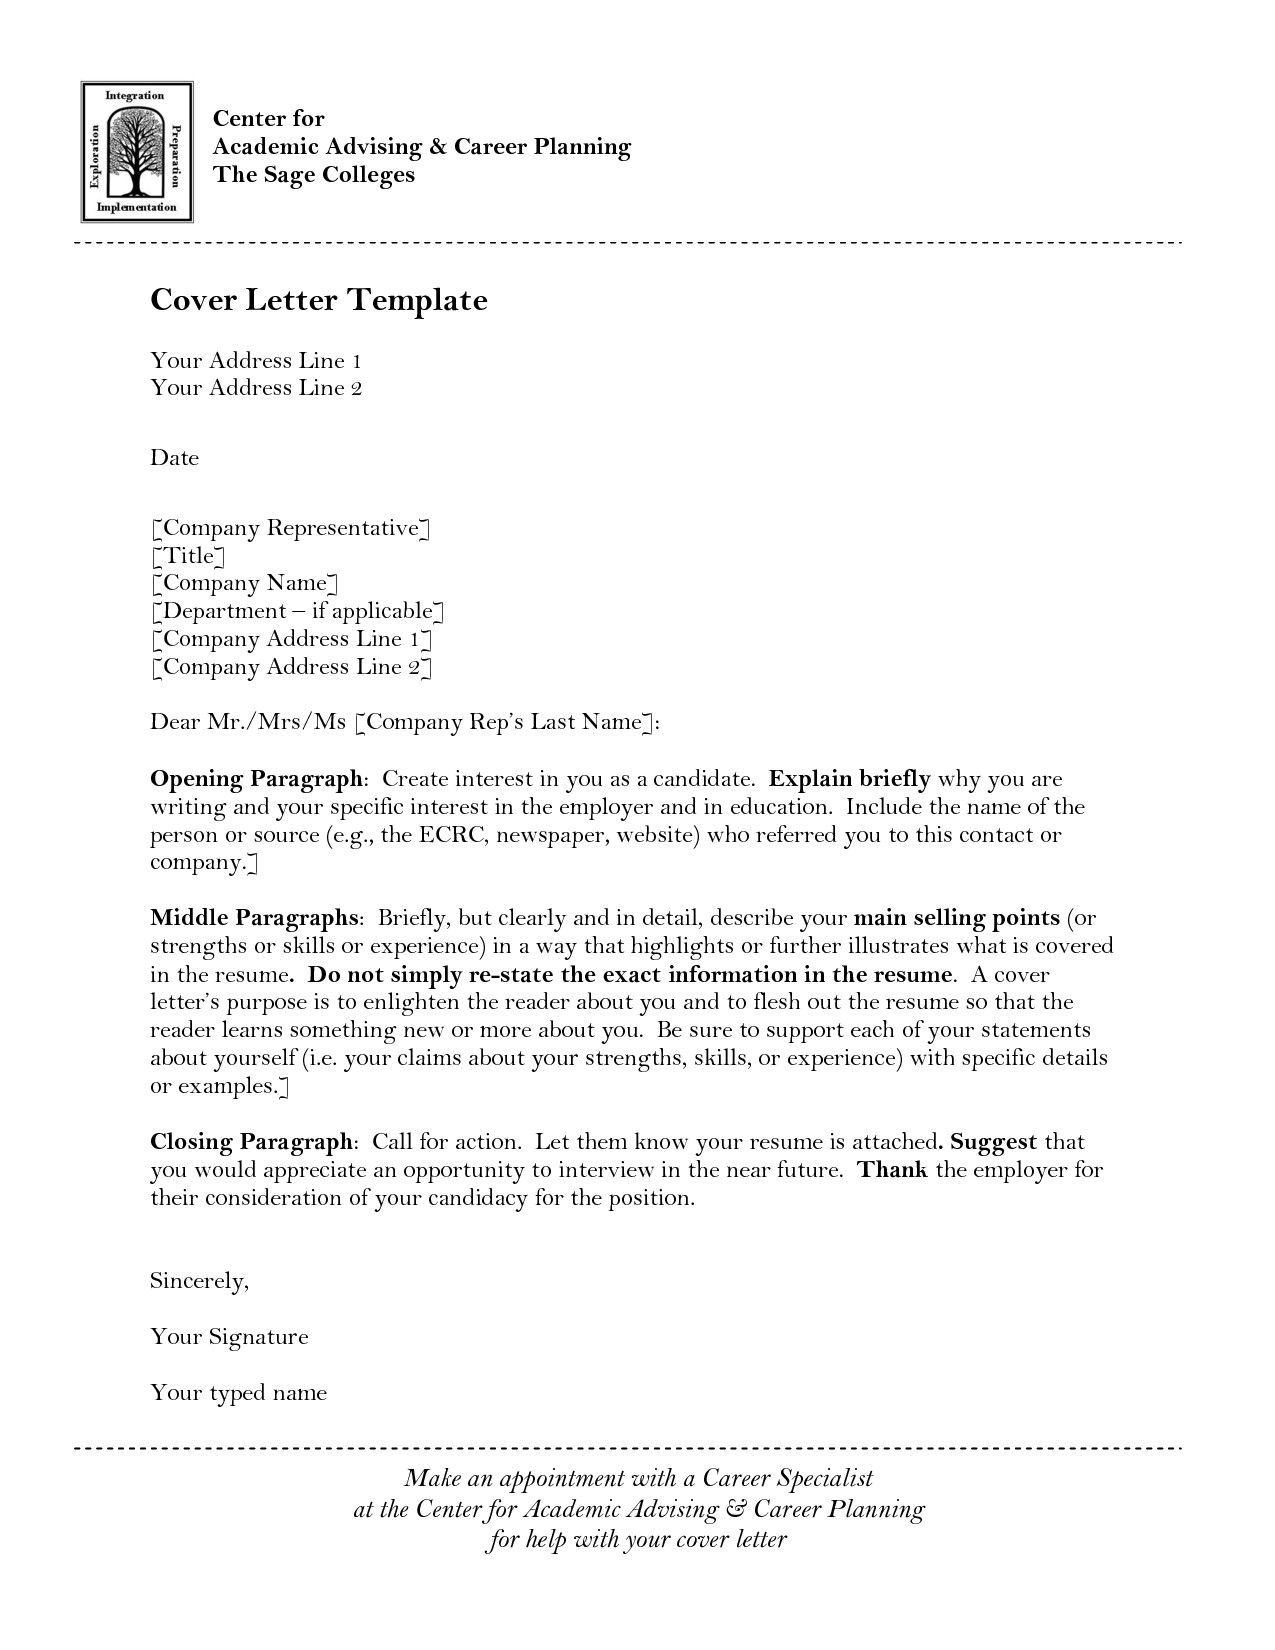 Help geometry homework problems